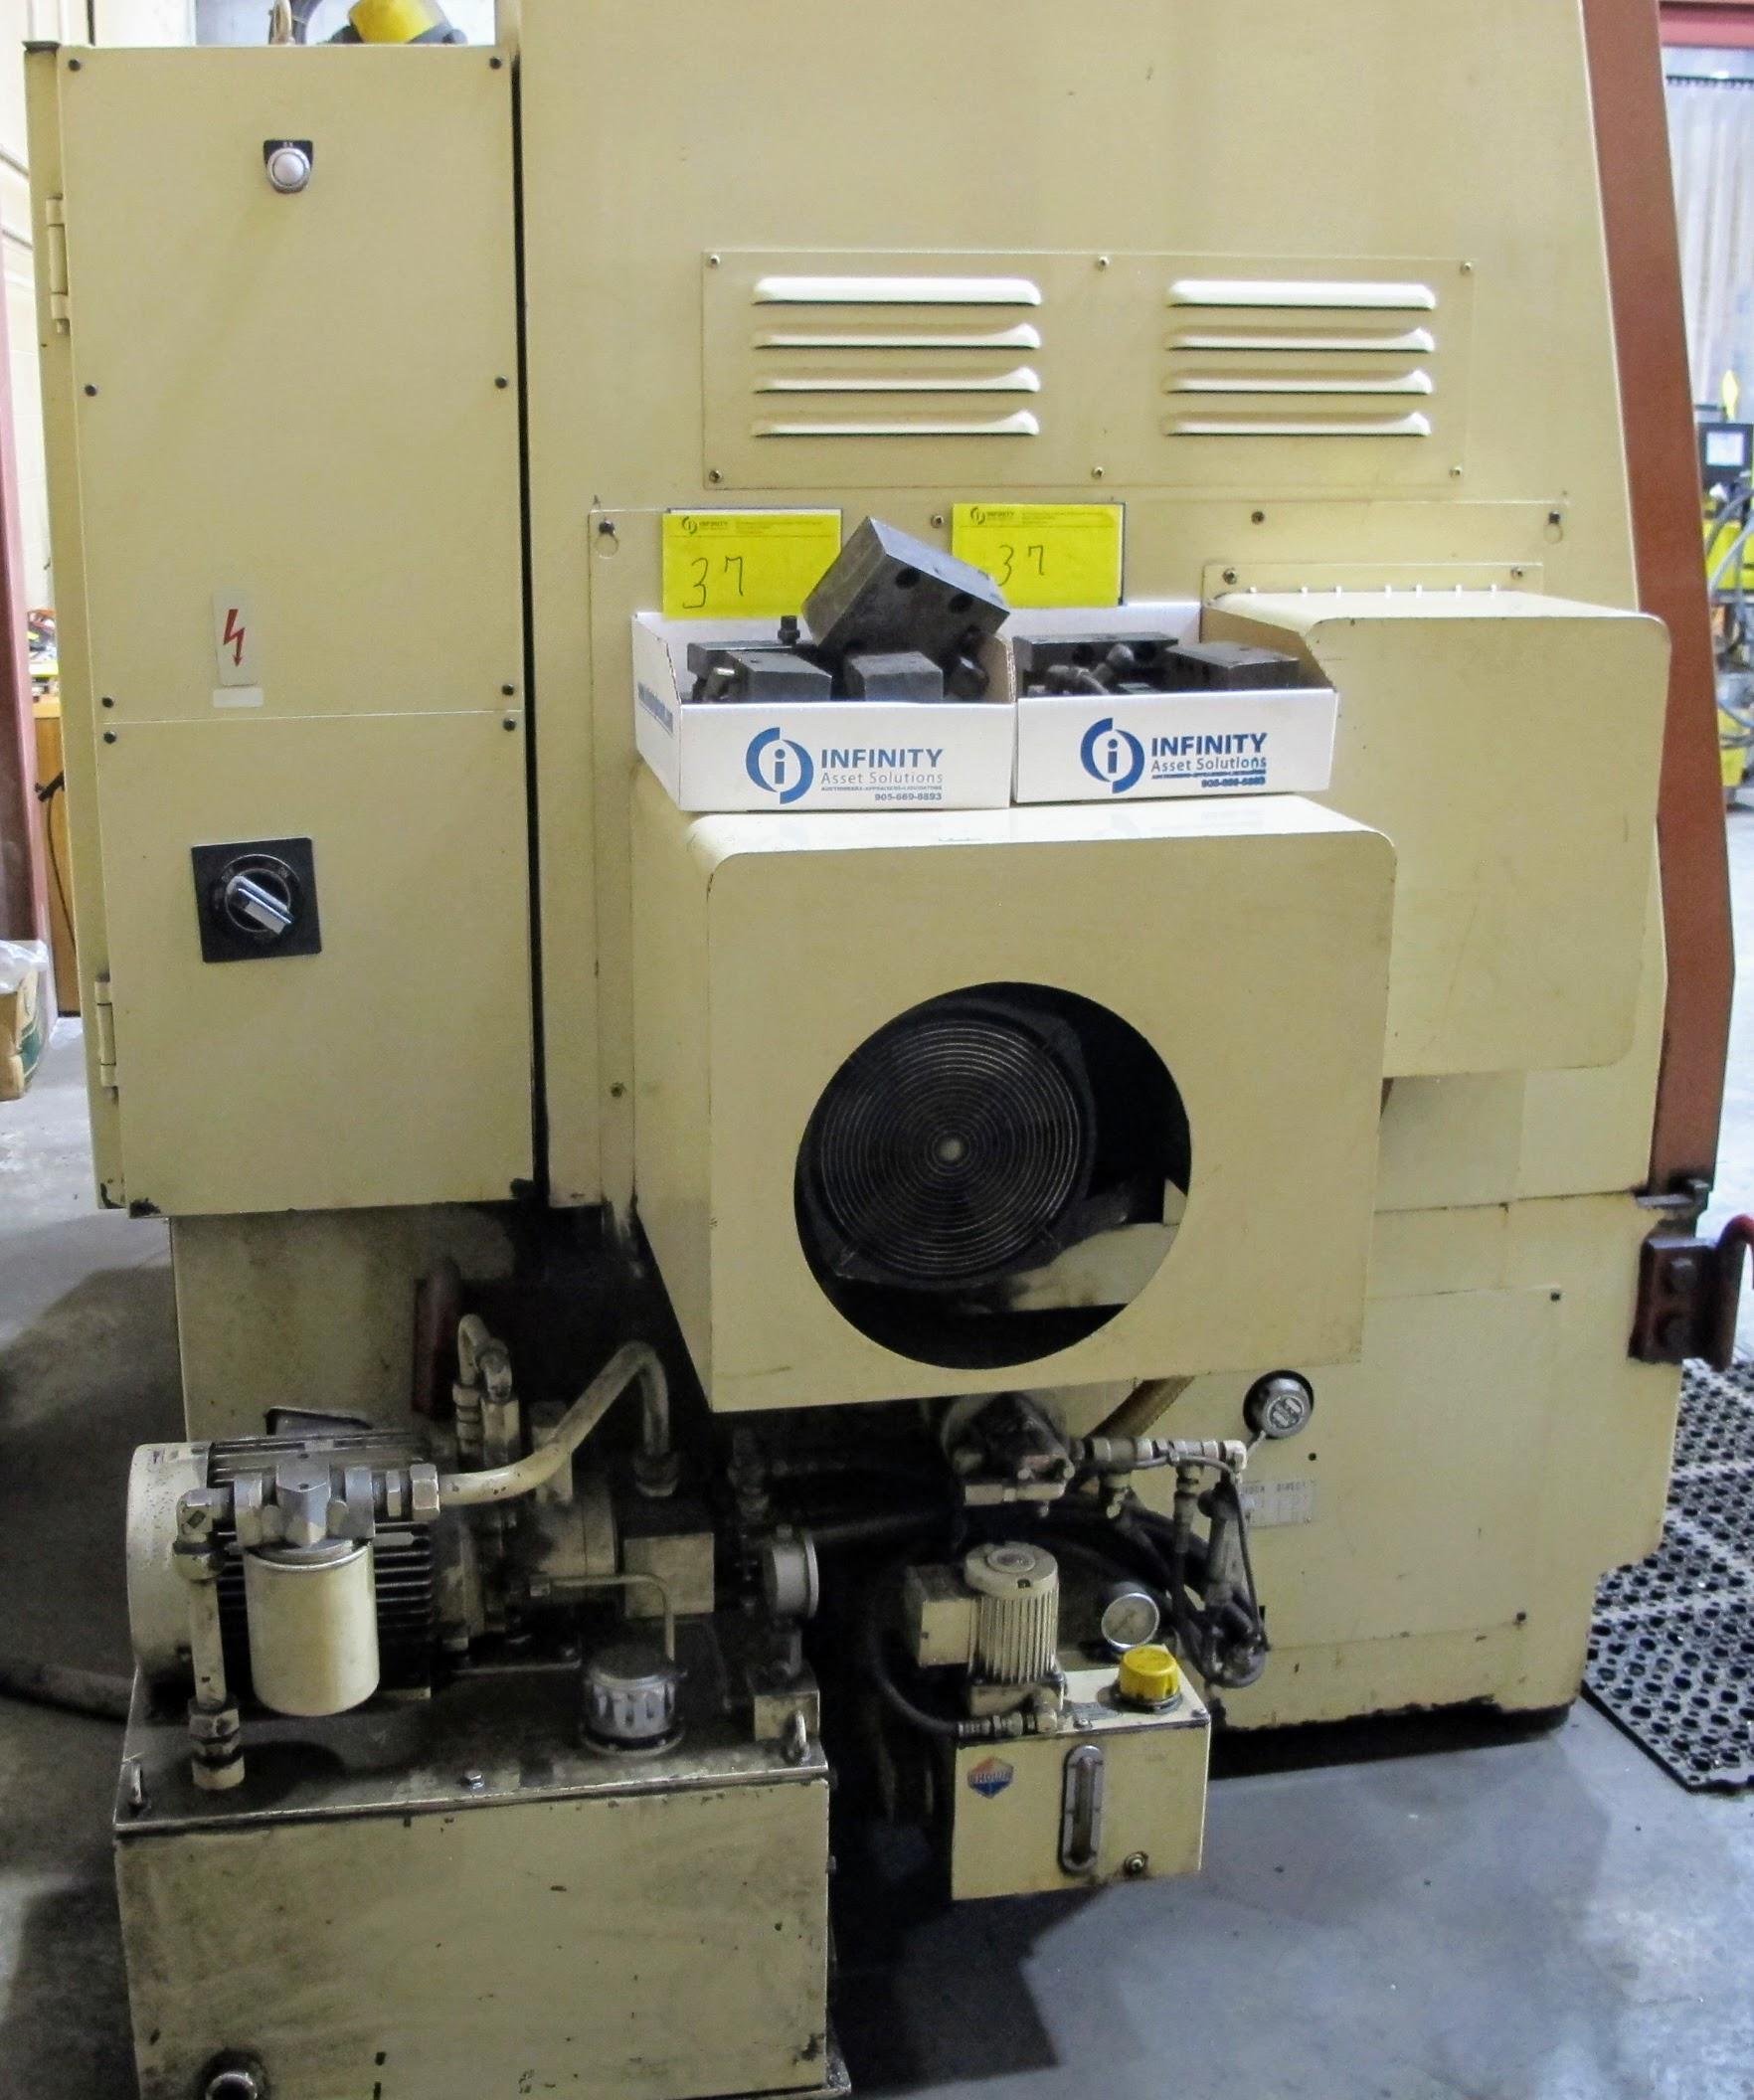 "OKUMA ACT-4 CNC LATHE W/12"" 3 JAW CHUCK, FANUC CONTROL, TAIL STOCK, ATC-12 W/10 TOOL HOLDERS, - Image 11 of 17"